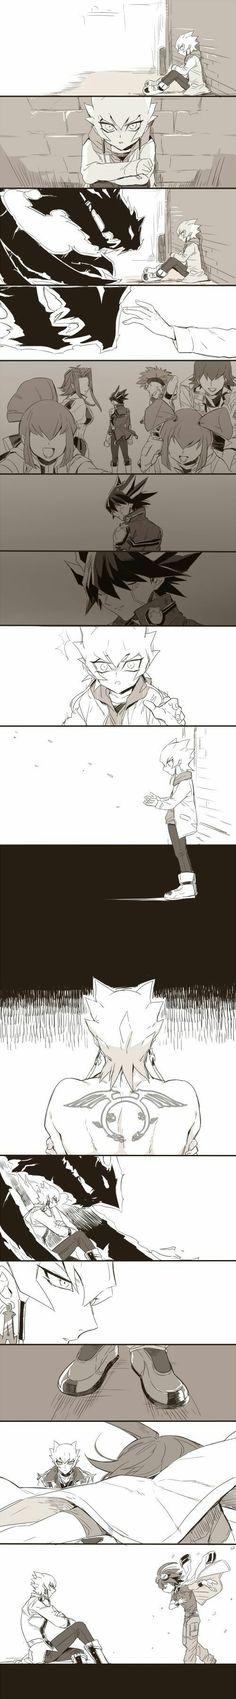 This Touched My Heart. Yu Gi Oh 5d's, Yo Gi Oh, Yugioh Dragon Cards, Yu Gi Oh Zexal, Cute Disney Drawings, Anime Character Drawing, Fan Art, Asuna, Anime Fantasy